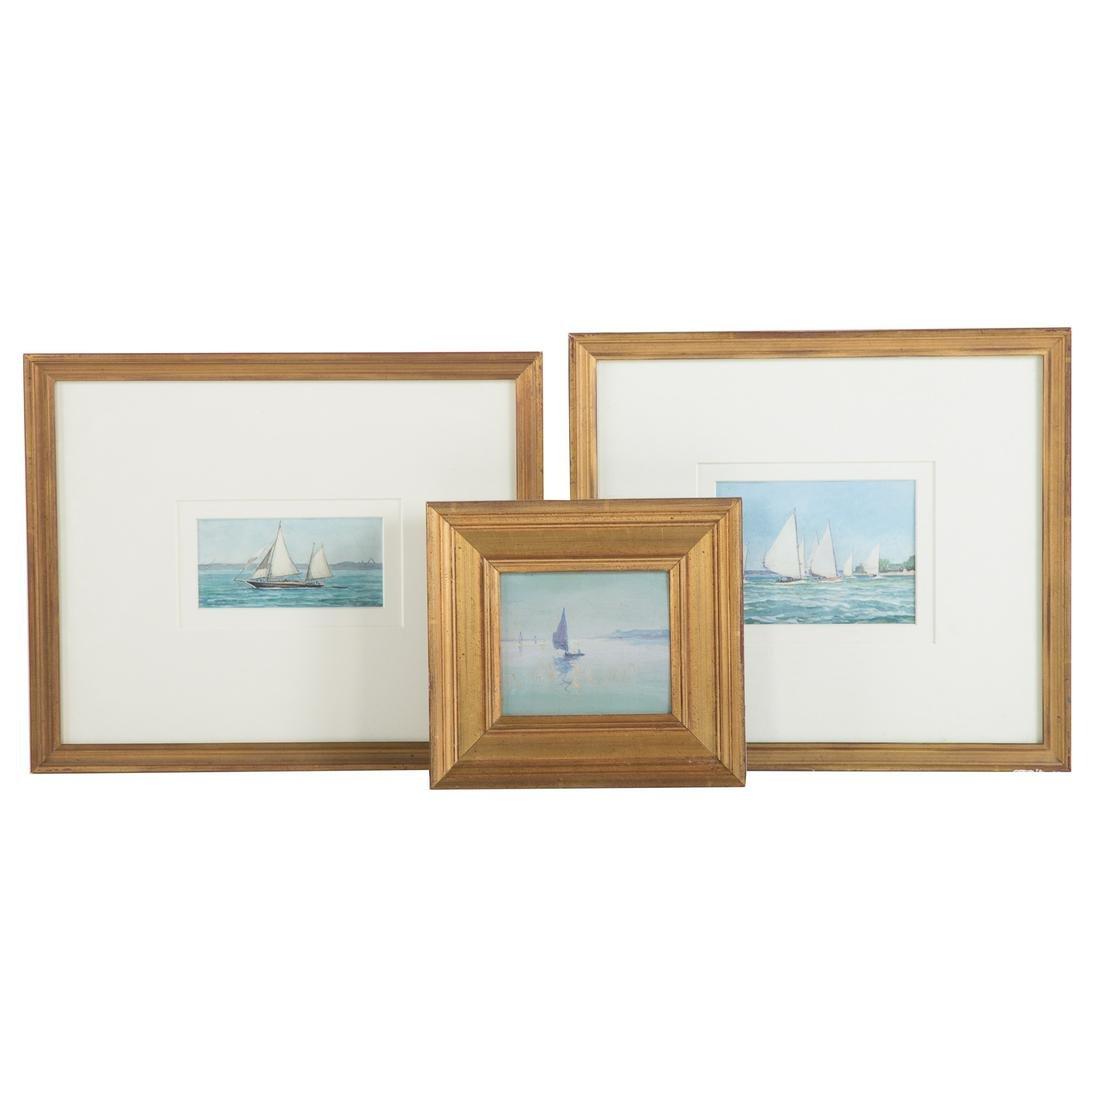 Attrib. to Louis J. Feuchter. Three Framed Works